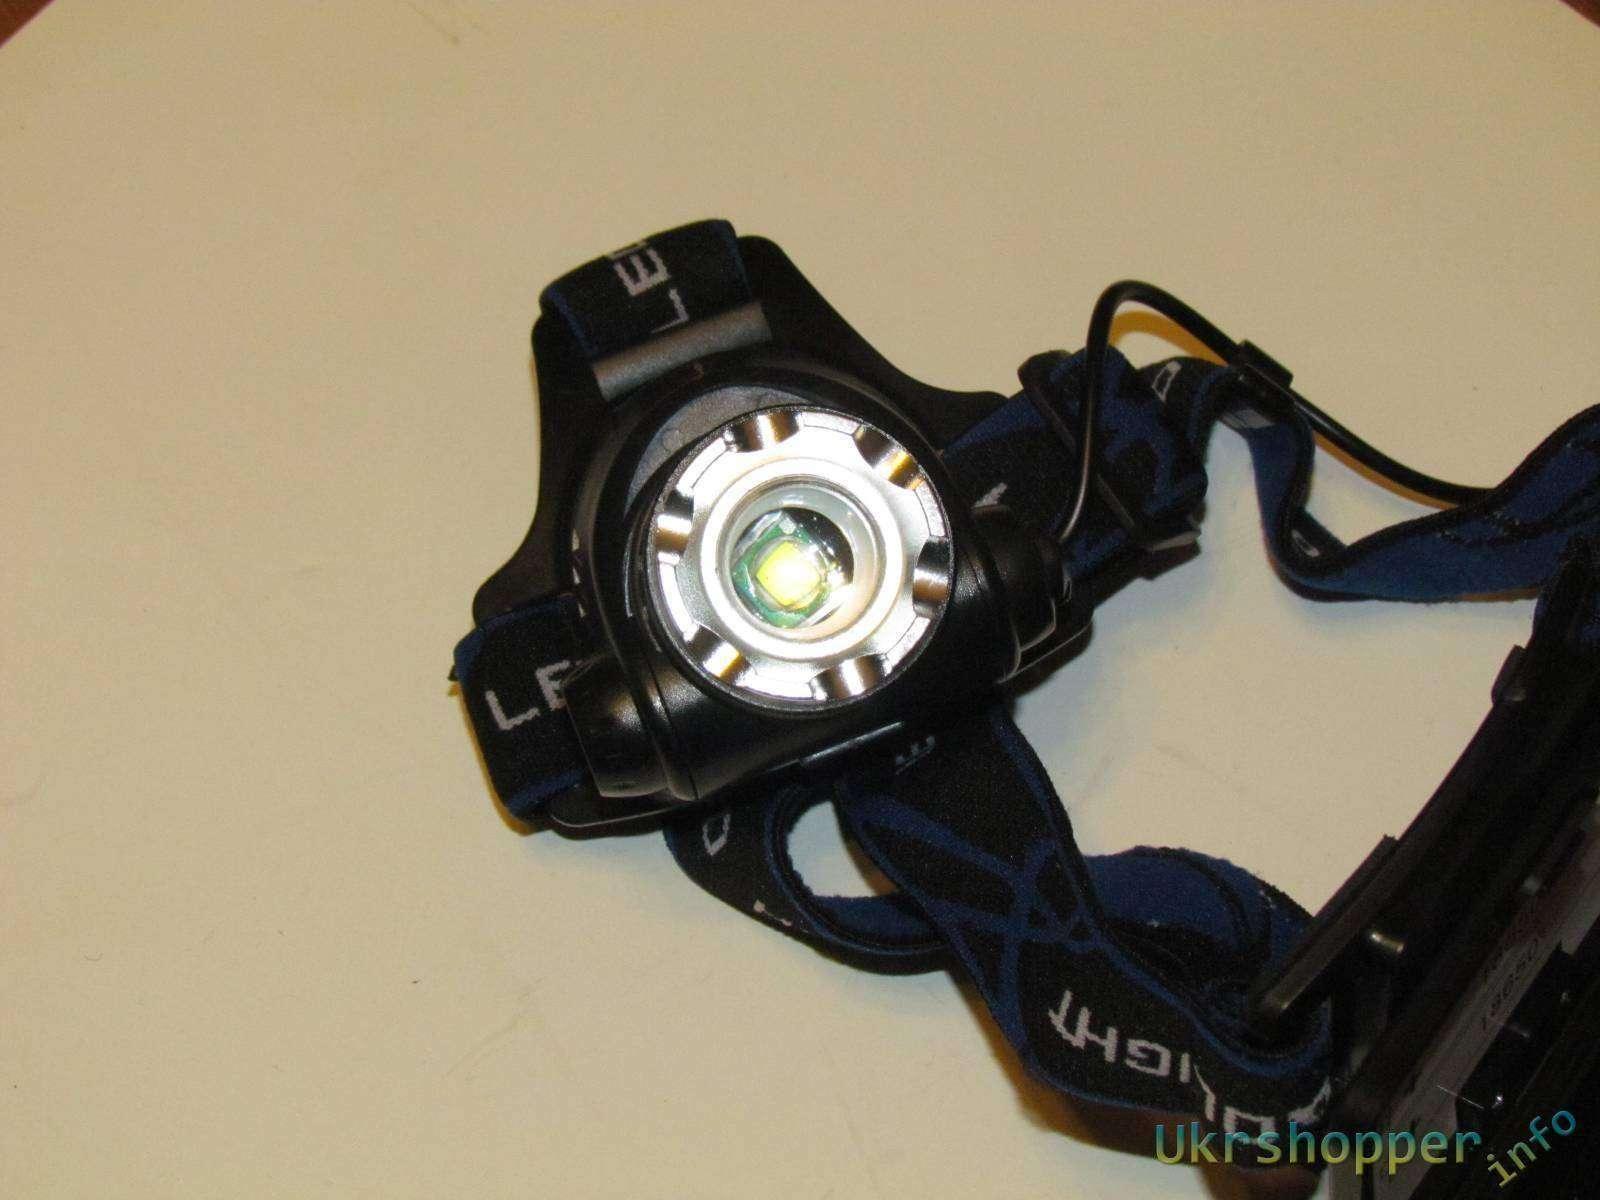 Aliexpress: Налобный яркий фонарь на диоде T6